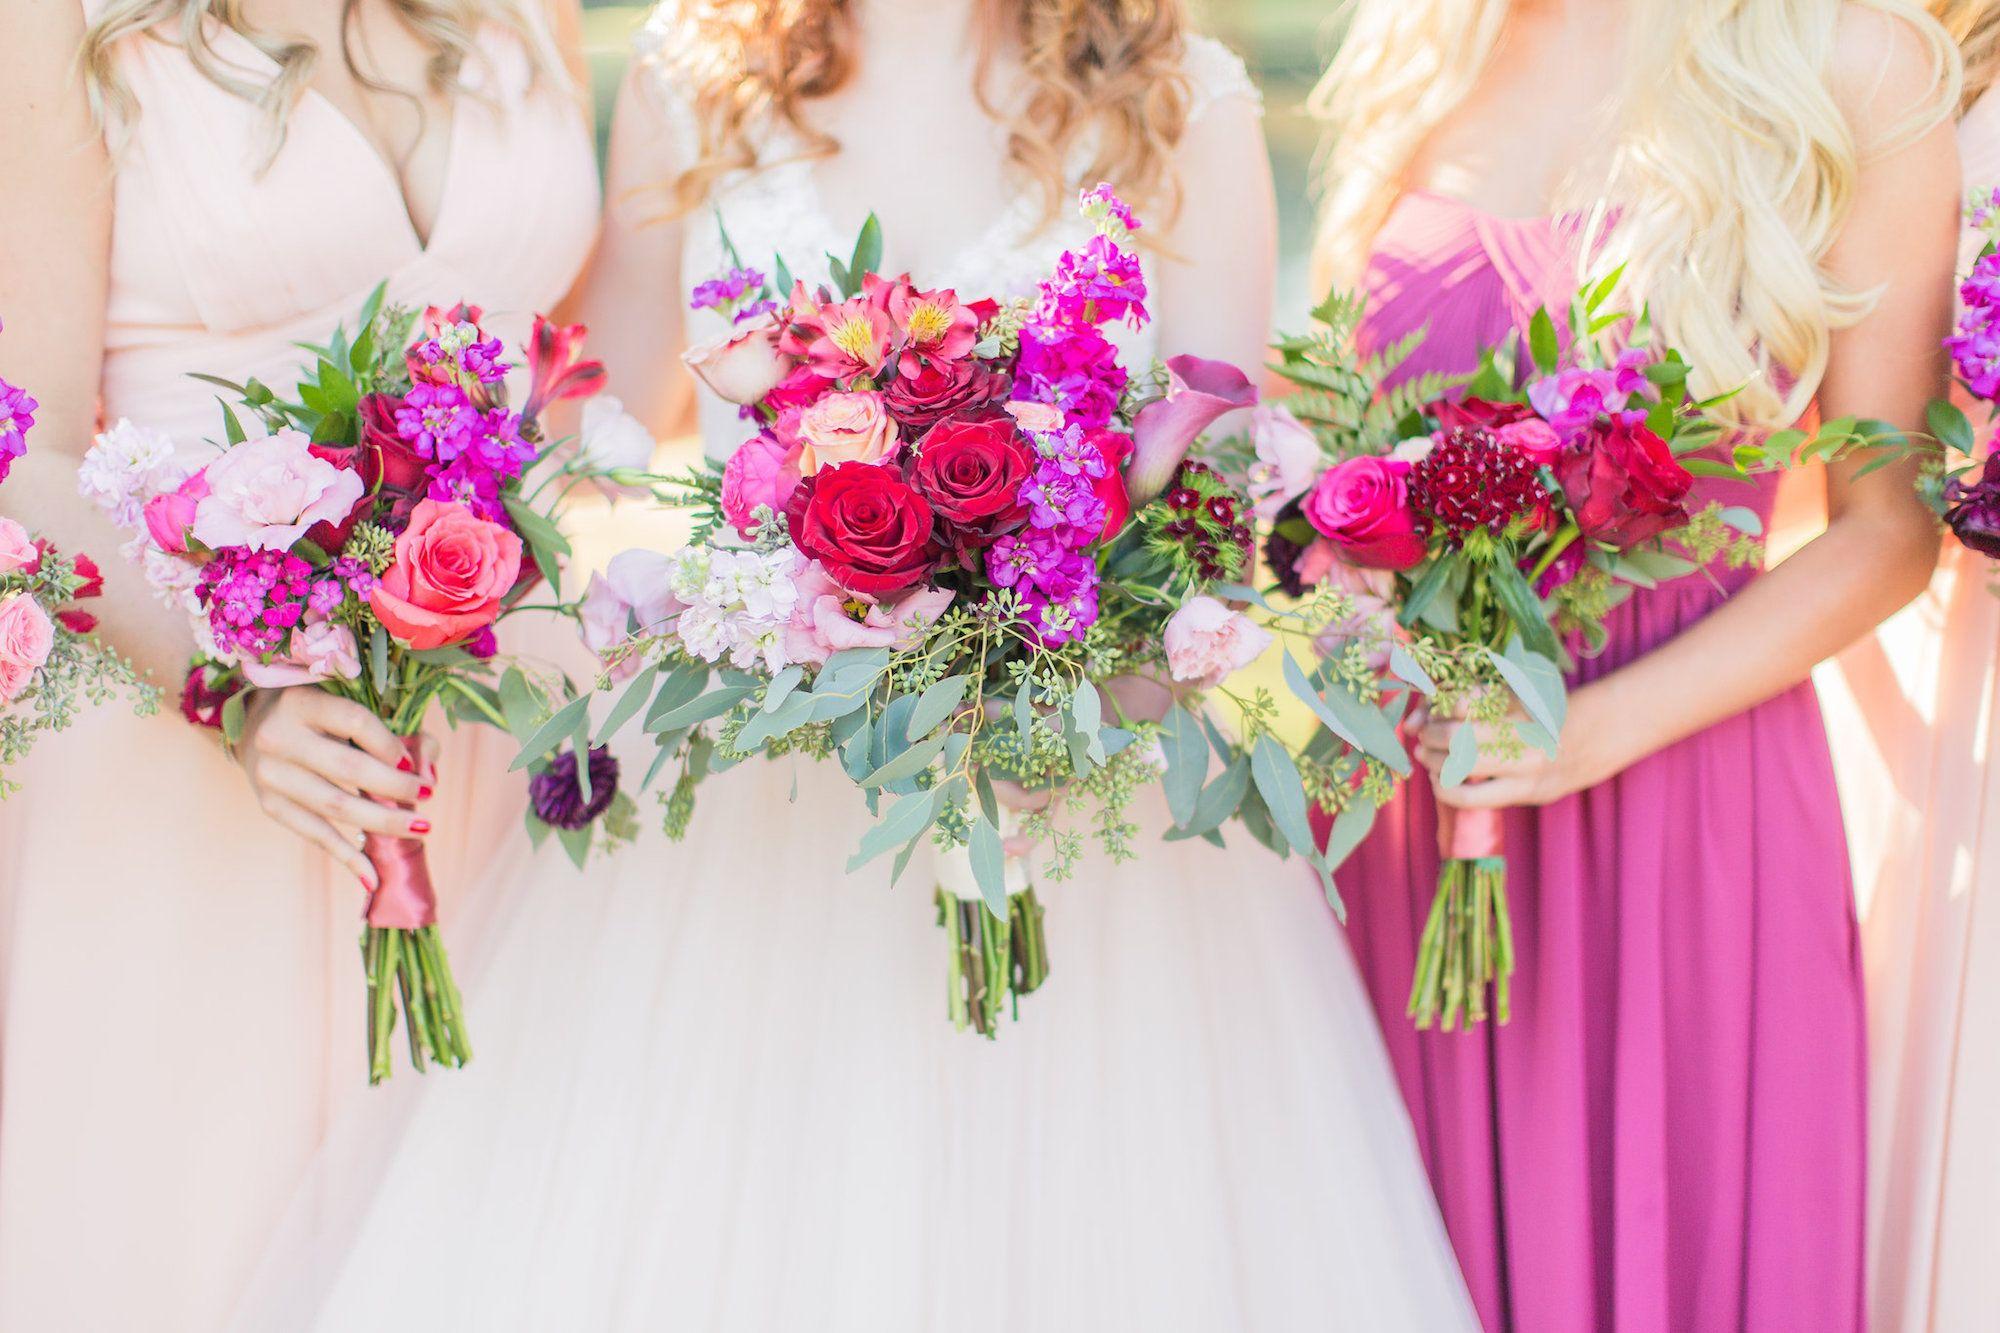 20 Best Spring Wedding Bouquets - Bridal Bouquets